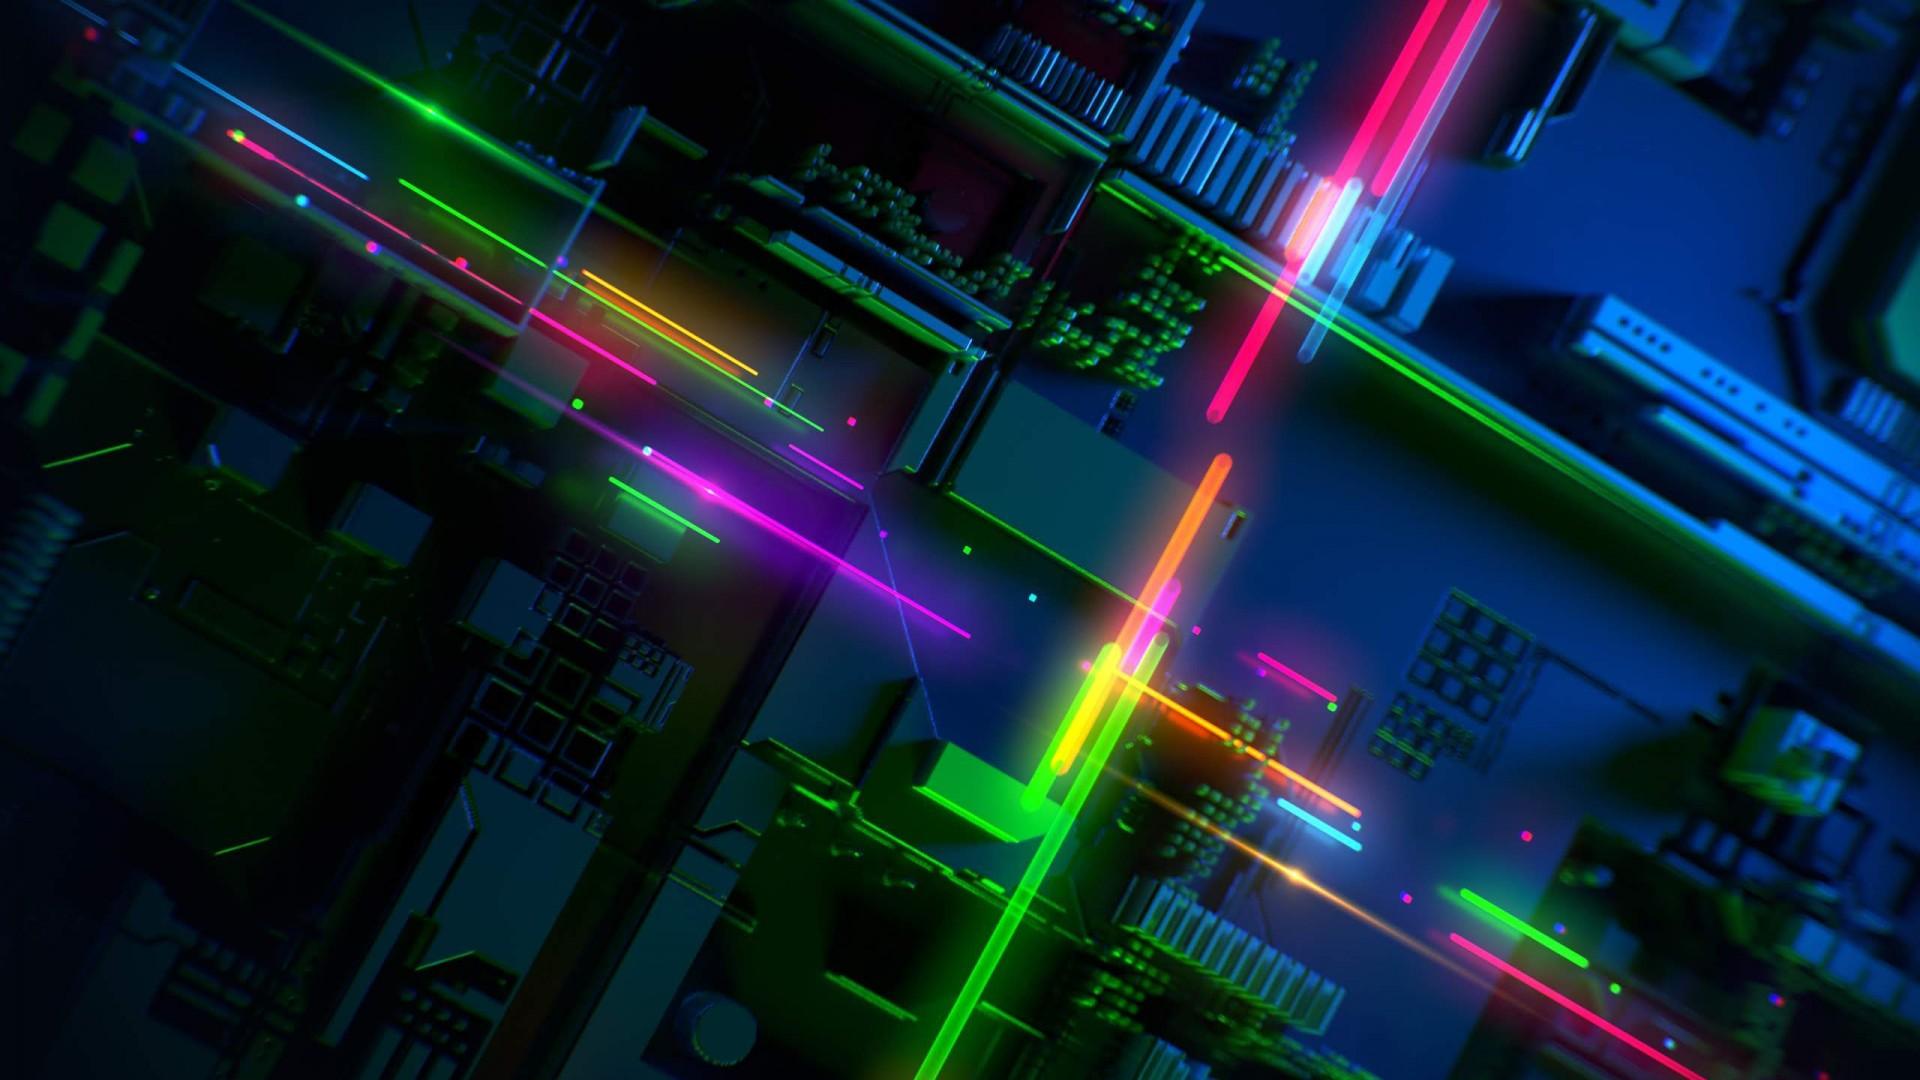 Wallpaper Razer Phone 2, abstract